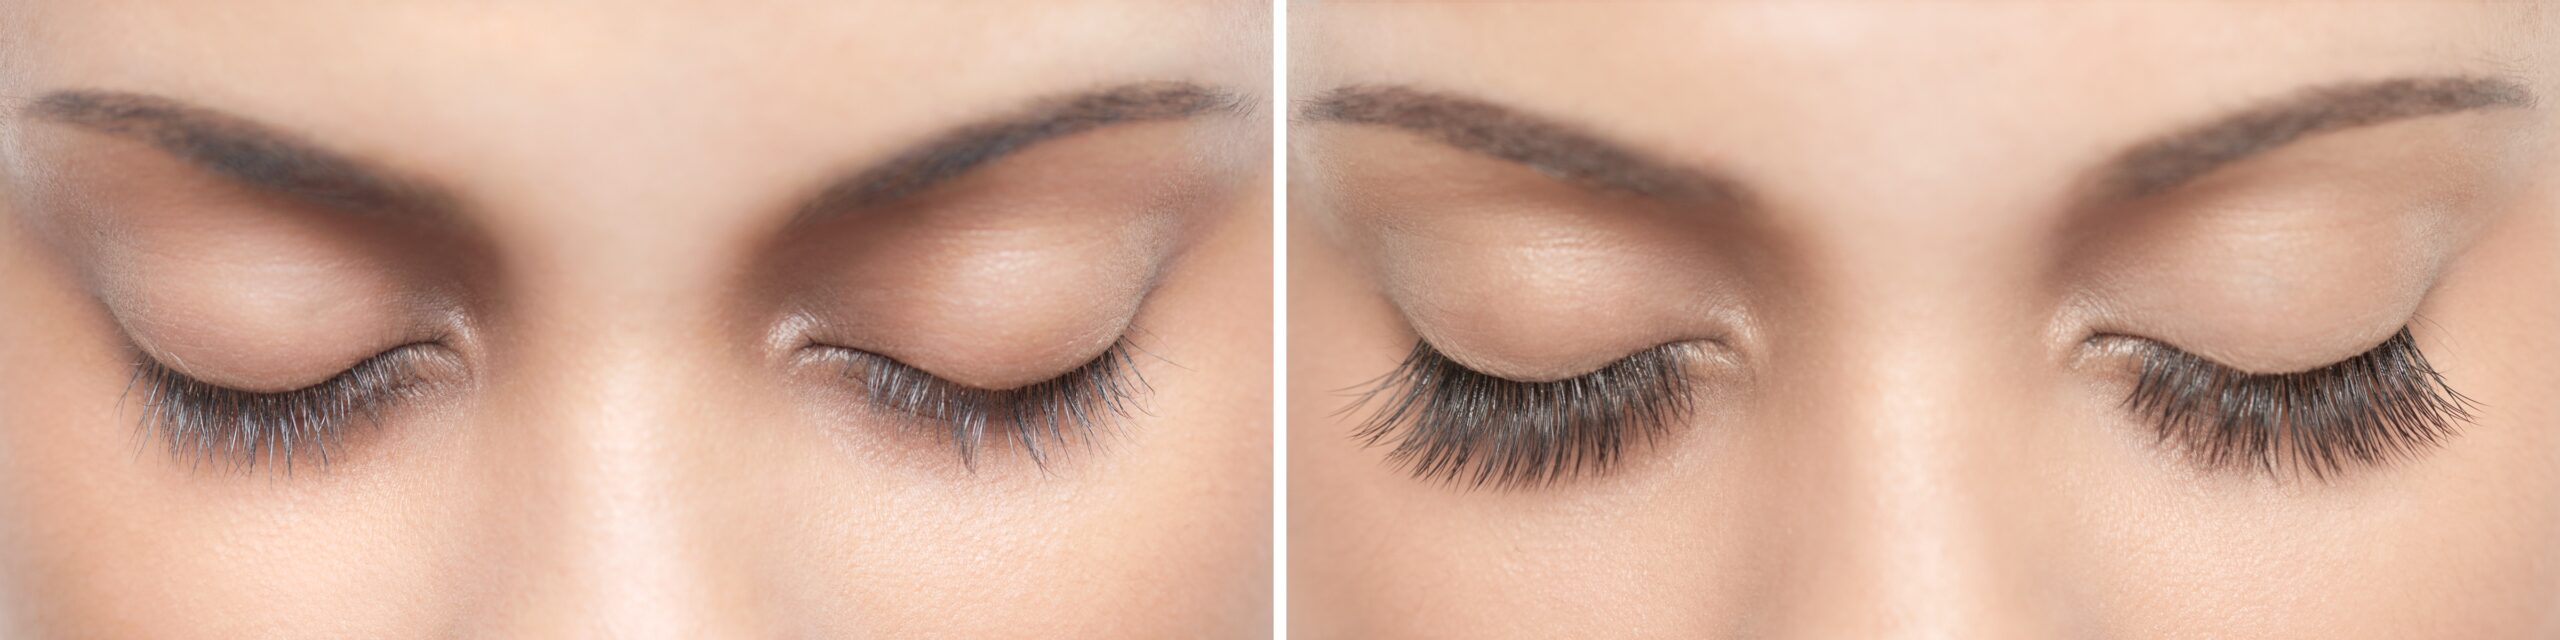 eyelash extensions asian eyes